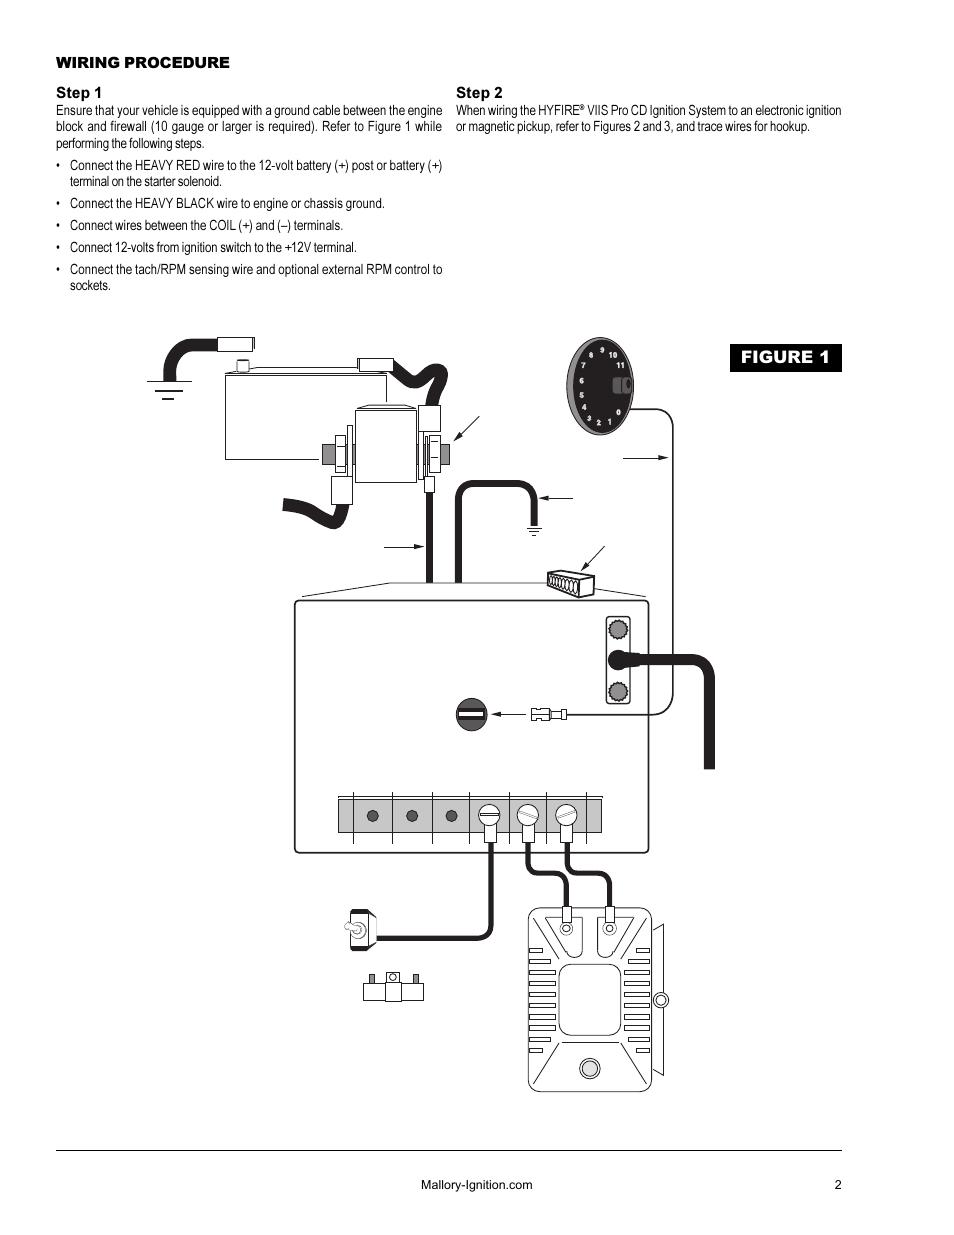 magnificent mallory hyfire ignition wiring diagram composition rh littleforestgirl net